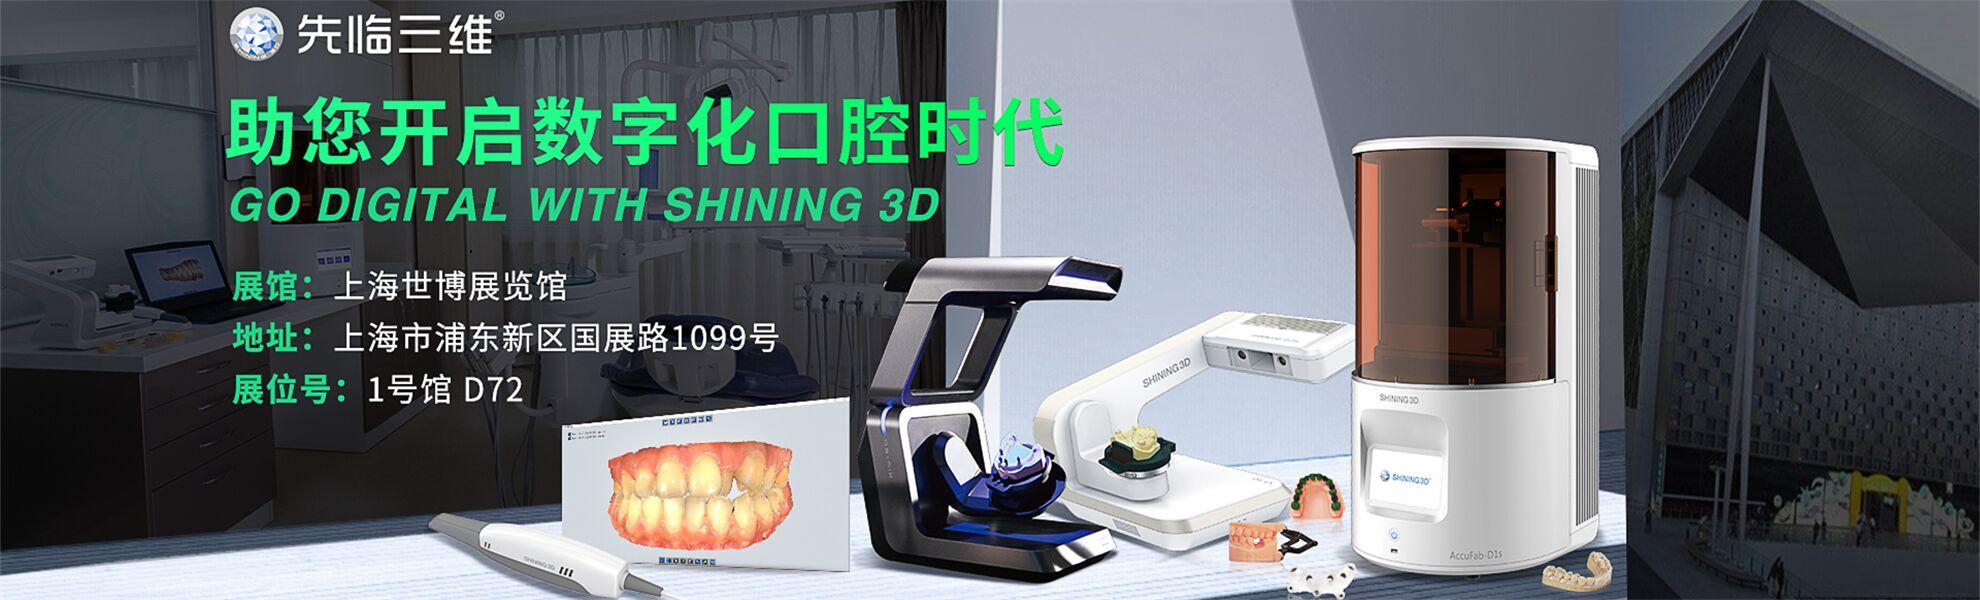 DS300齿科三维扫描仪描仪